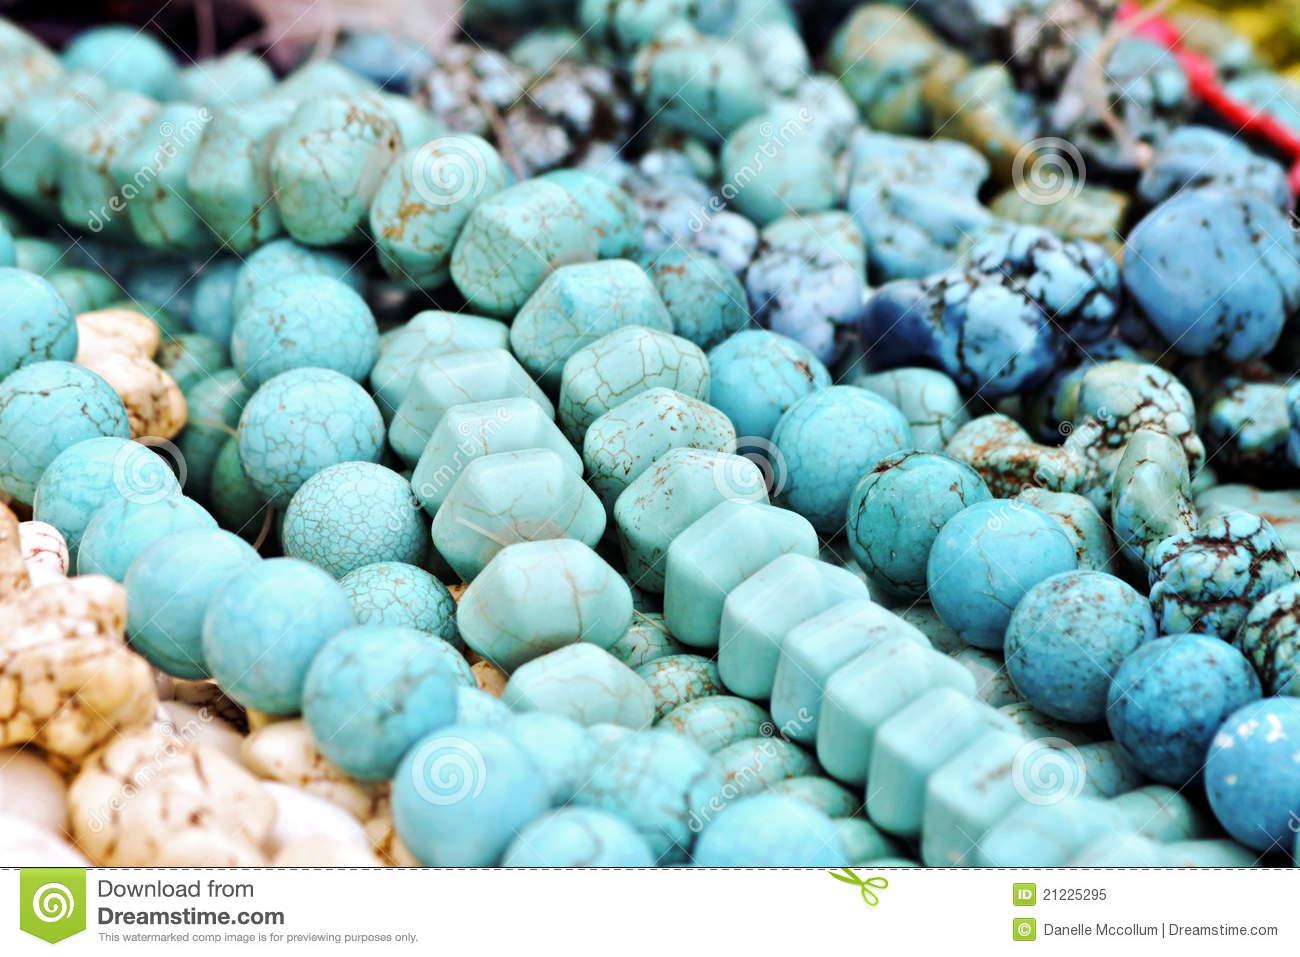 turquoise-beads-21225295.jpg